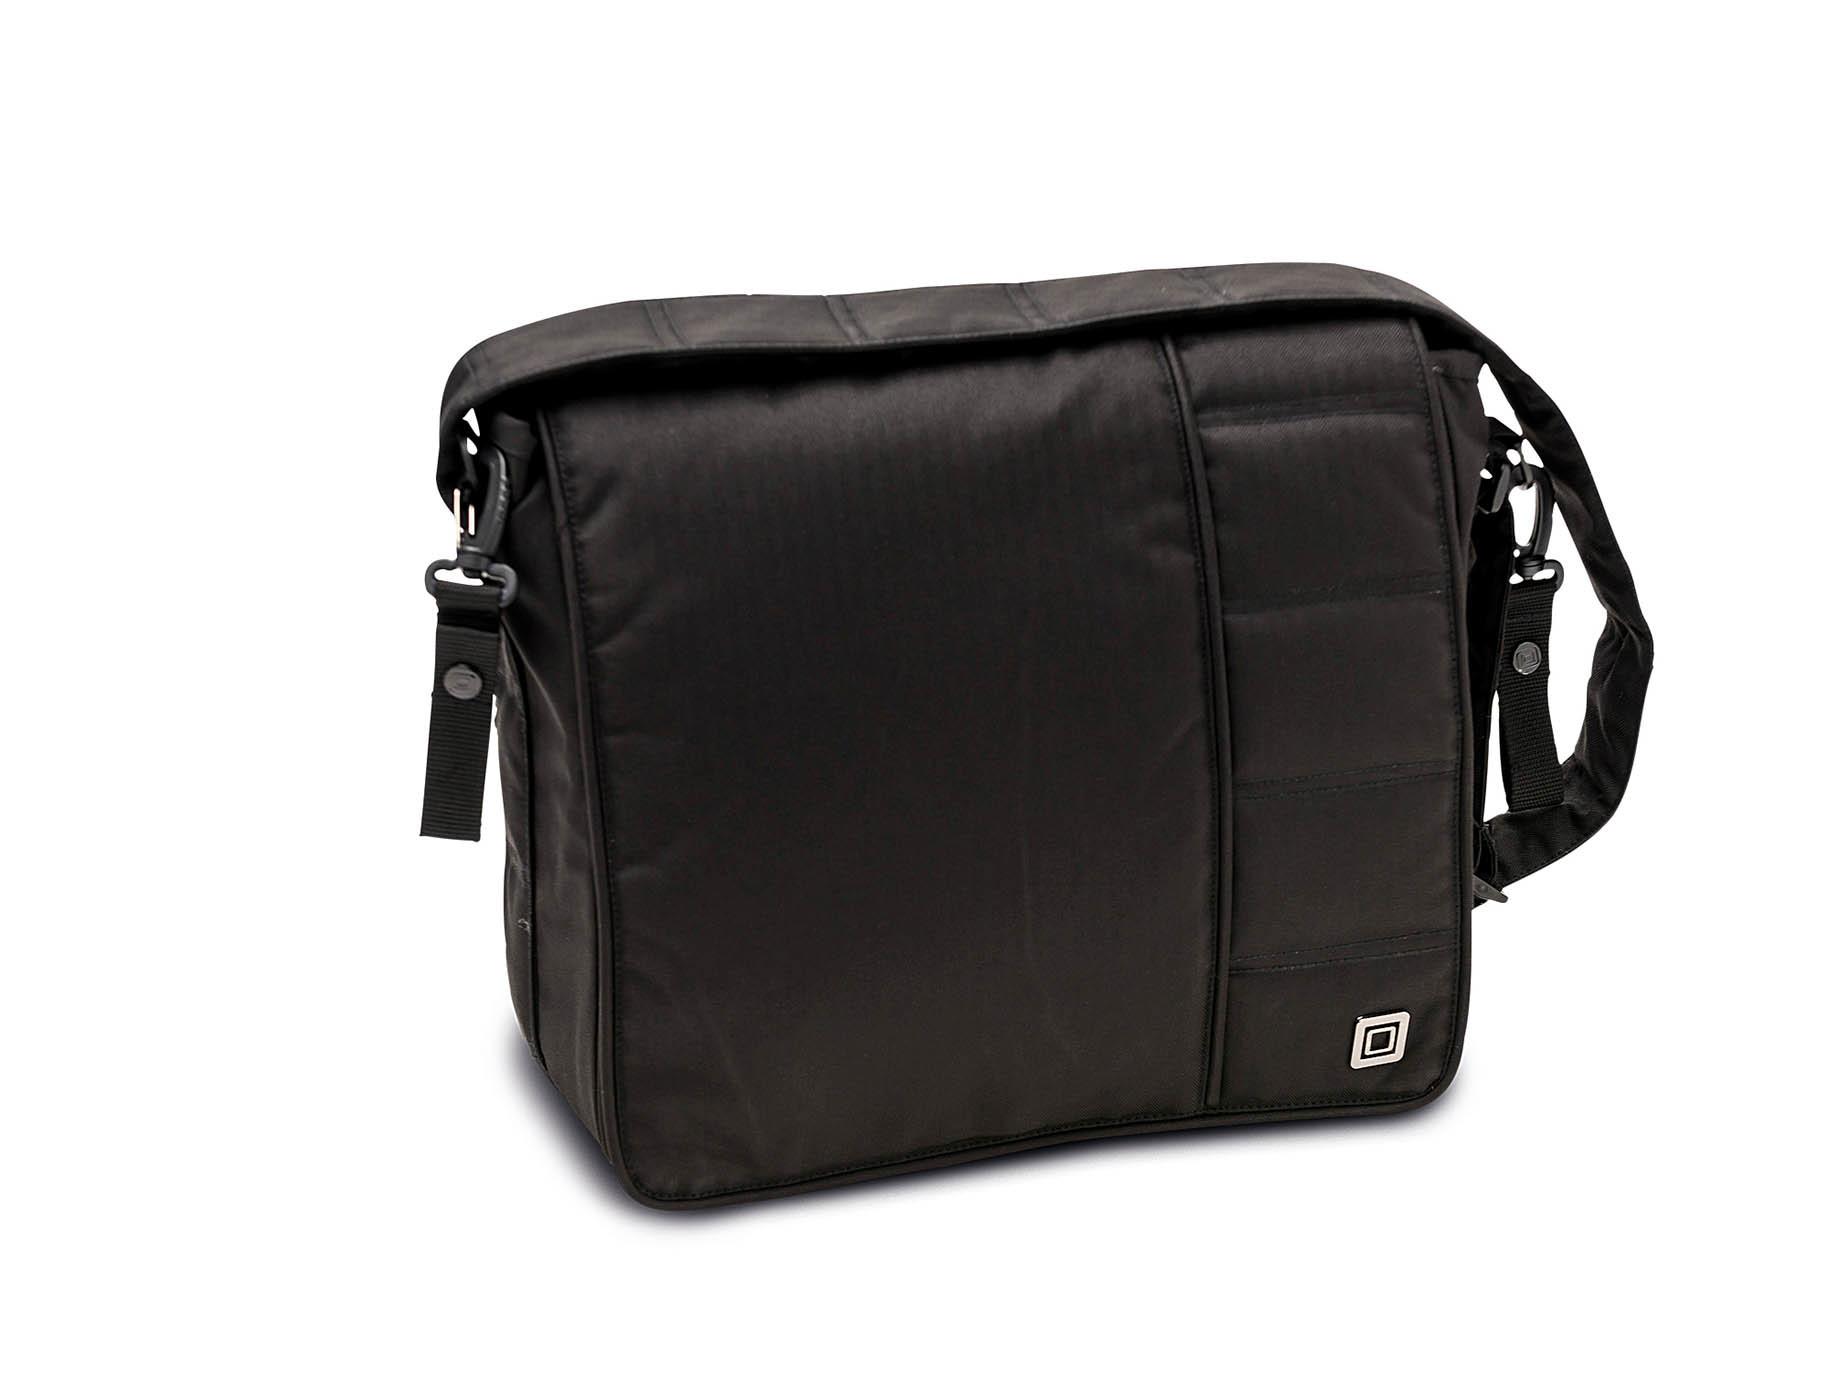 Сумка для коляски Messenger Bag 2018